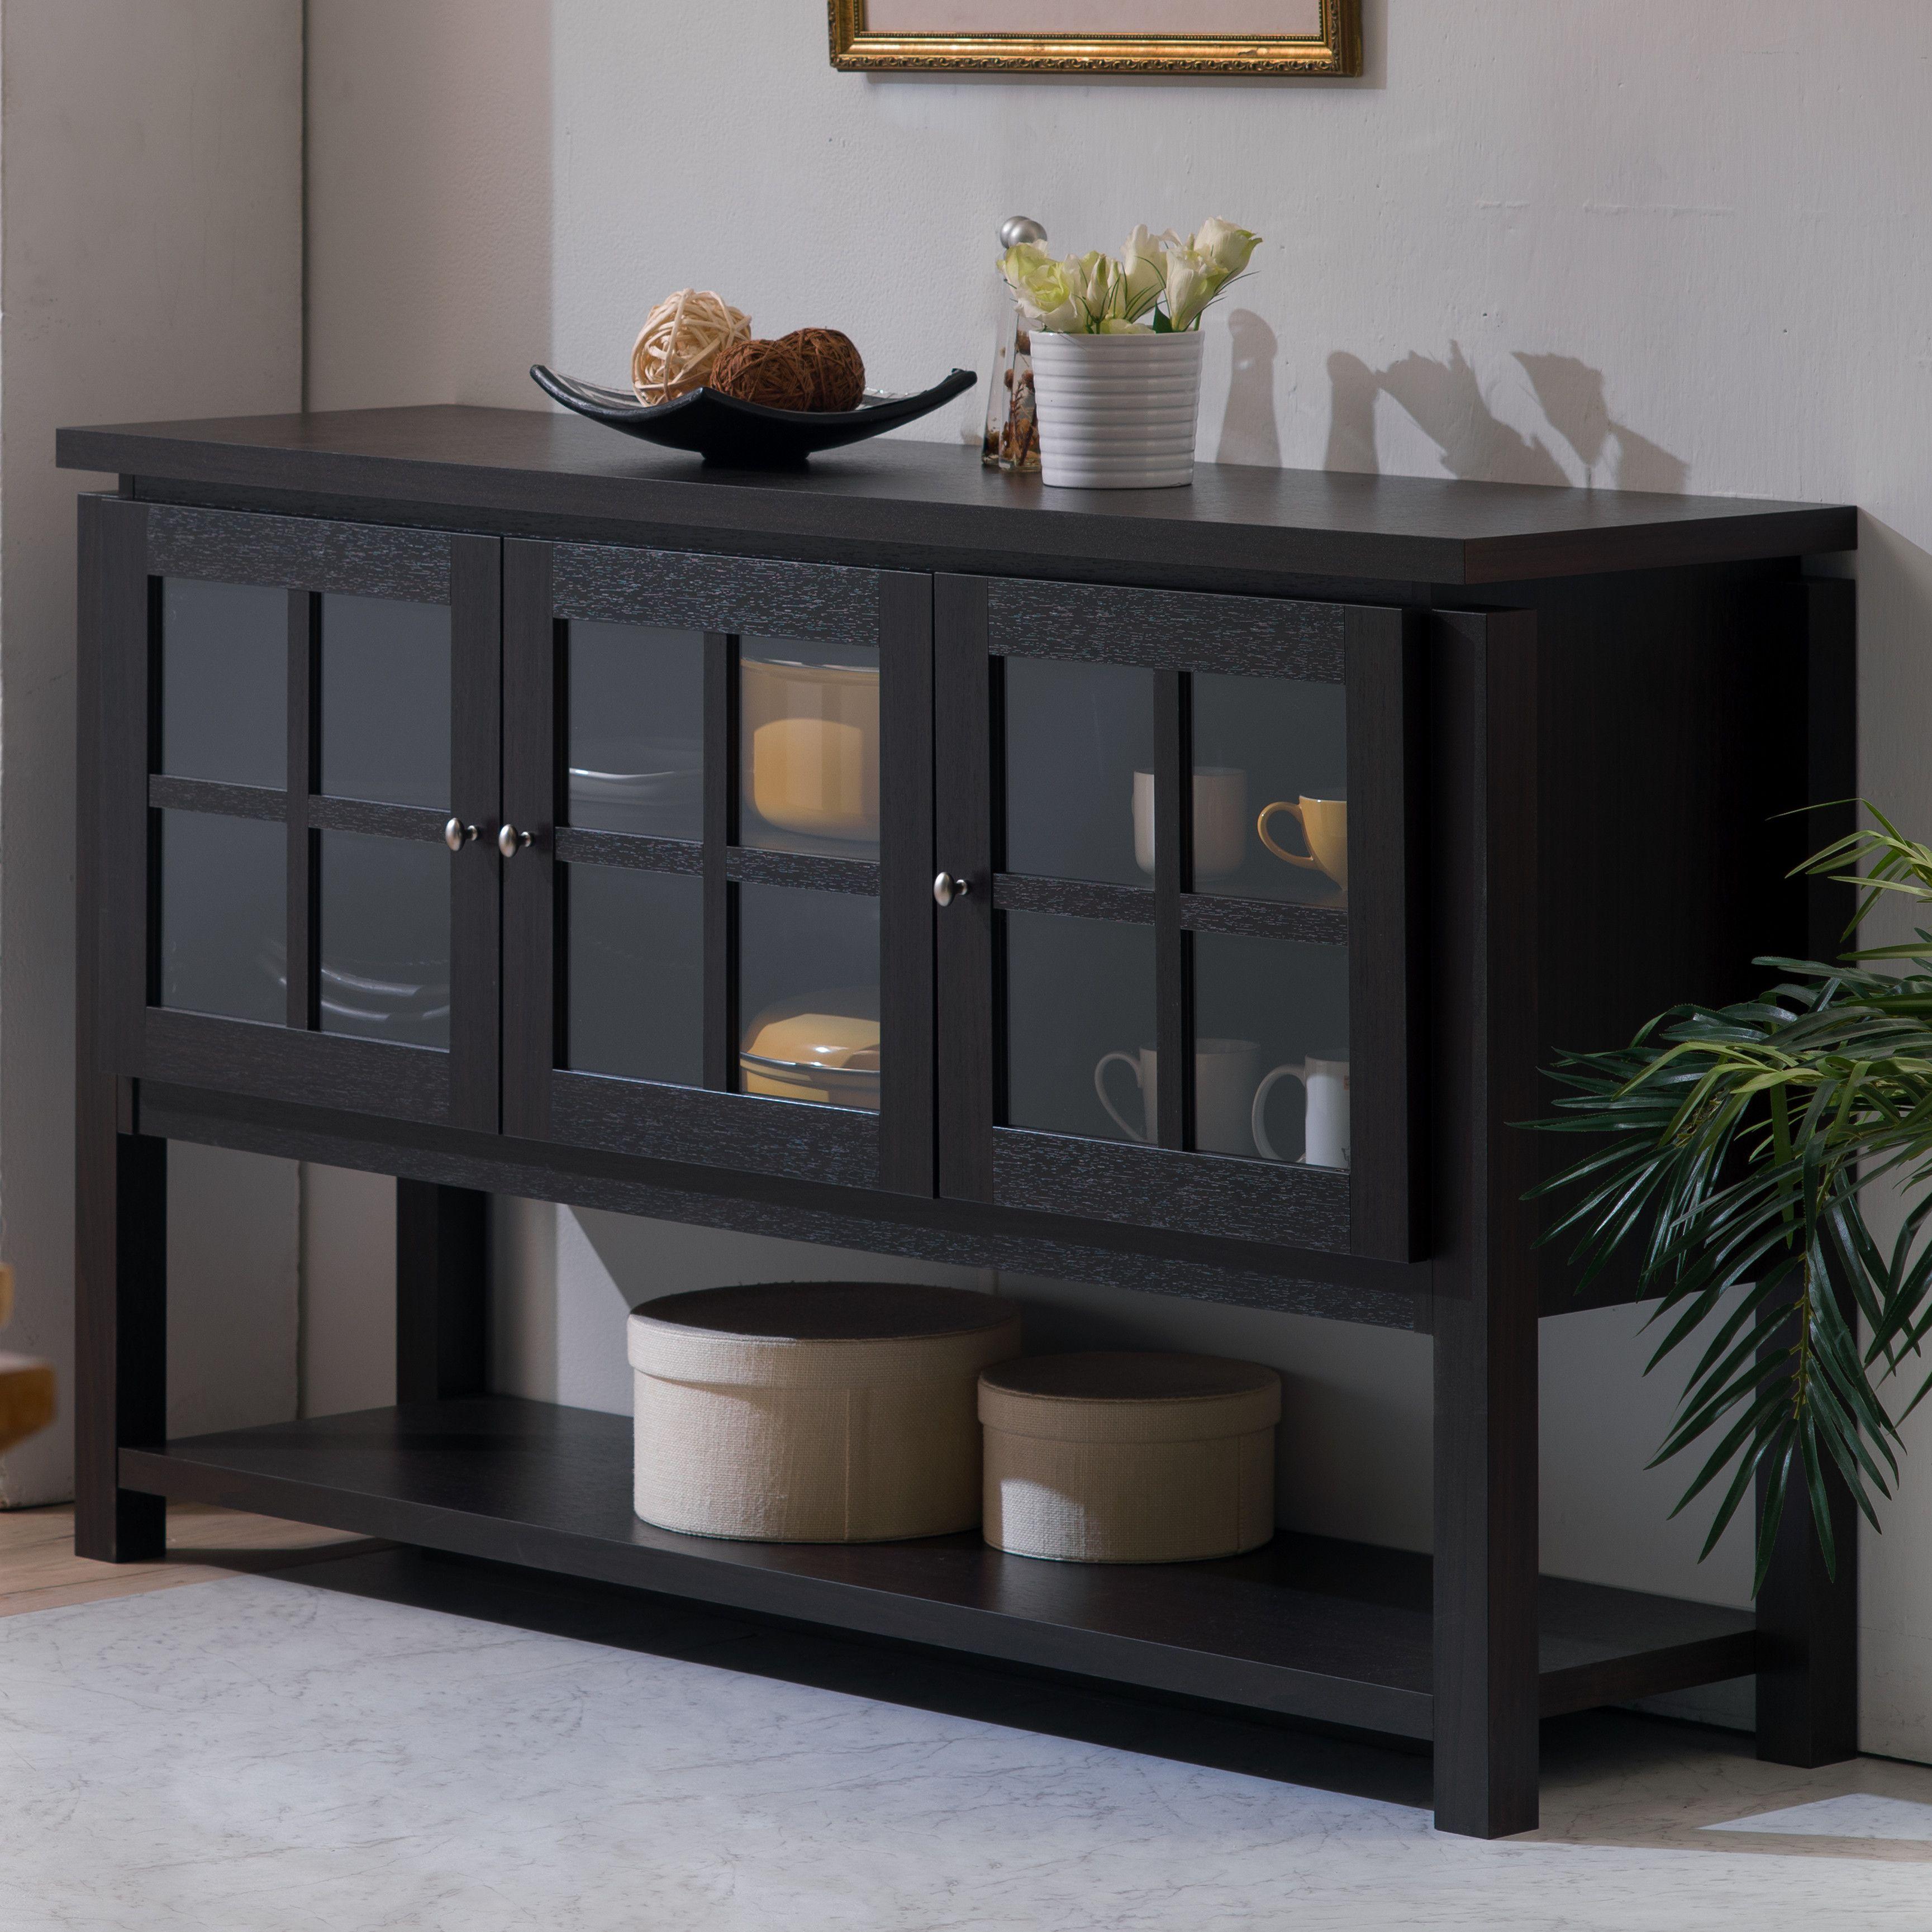 modern dining room furniture buffet. Hokku Designs Mavado Dining Buffet Modern Room Furniture Y